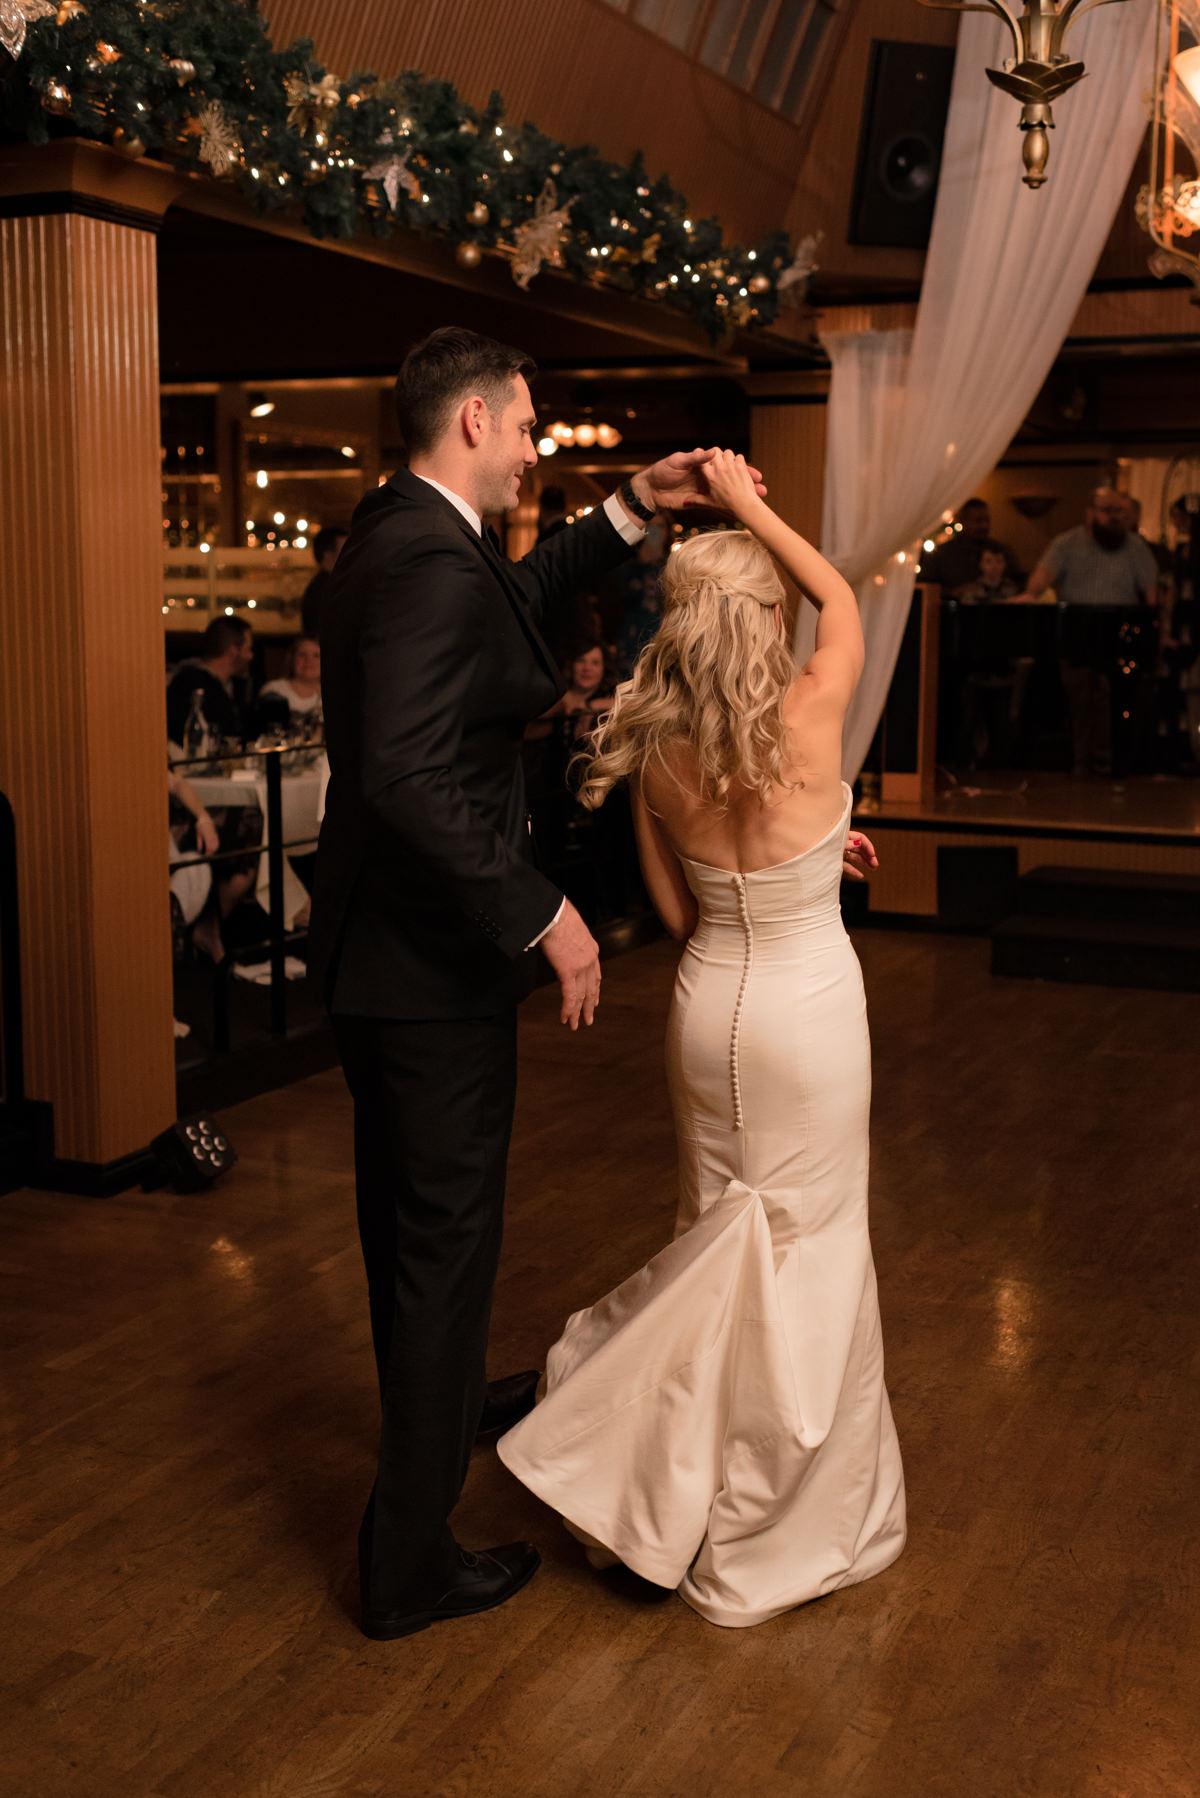 Andrew Tat - Documentary Wedding Photography - Lake Union Cafe - Seattle, Washington -Rachel and Ryan - 49.jpg